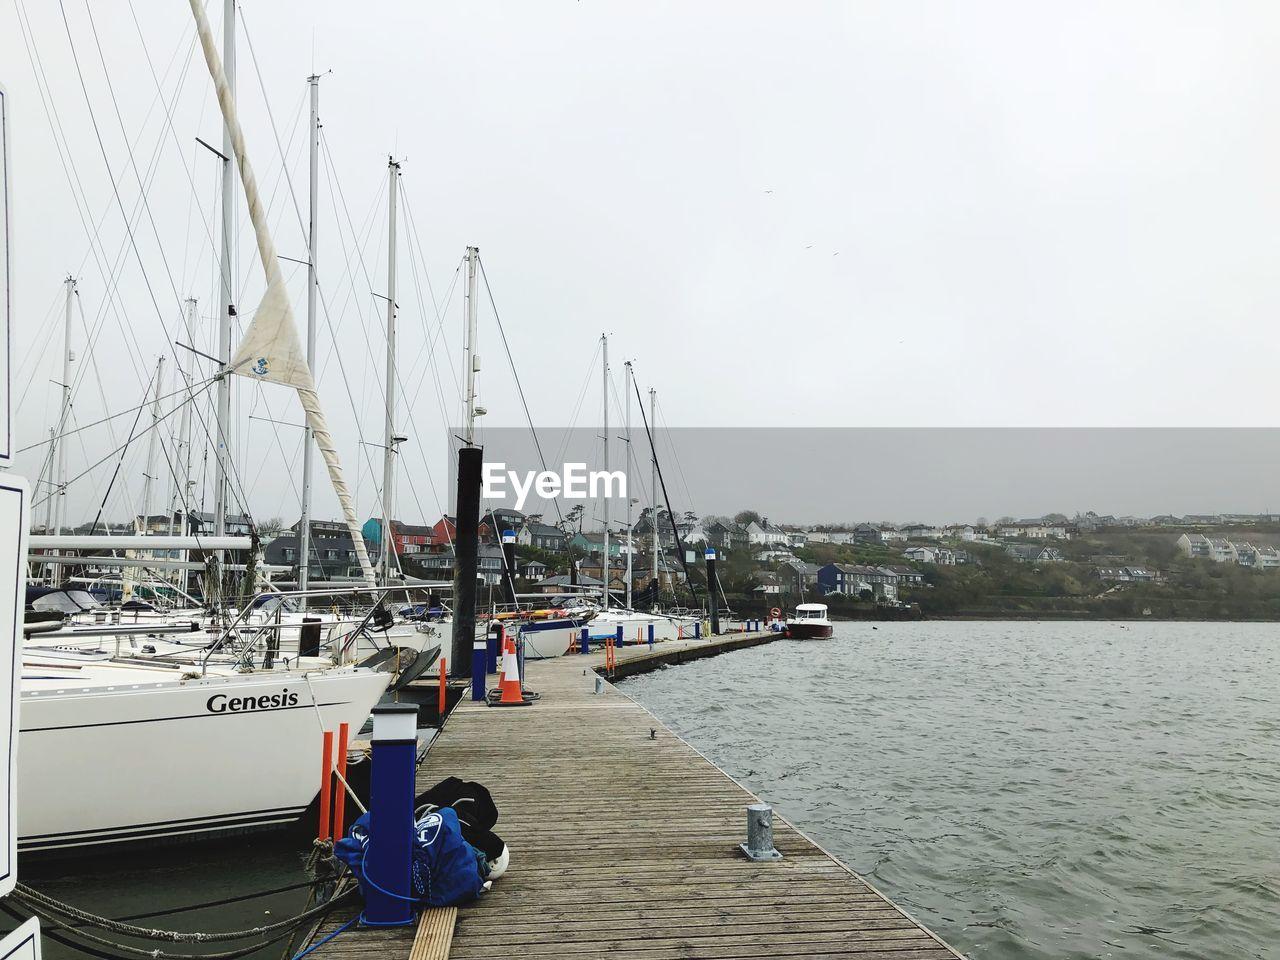 nautical vessel, water, transportation, mode of transportation, sailboat, pole, sky, sea, moored, nature, mast, day, harbor, pier, real people, travel, sailing, outdoors, men, yacht, marina